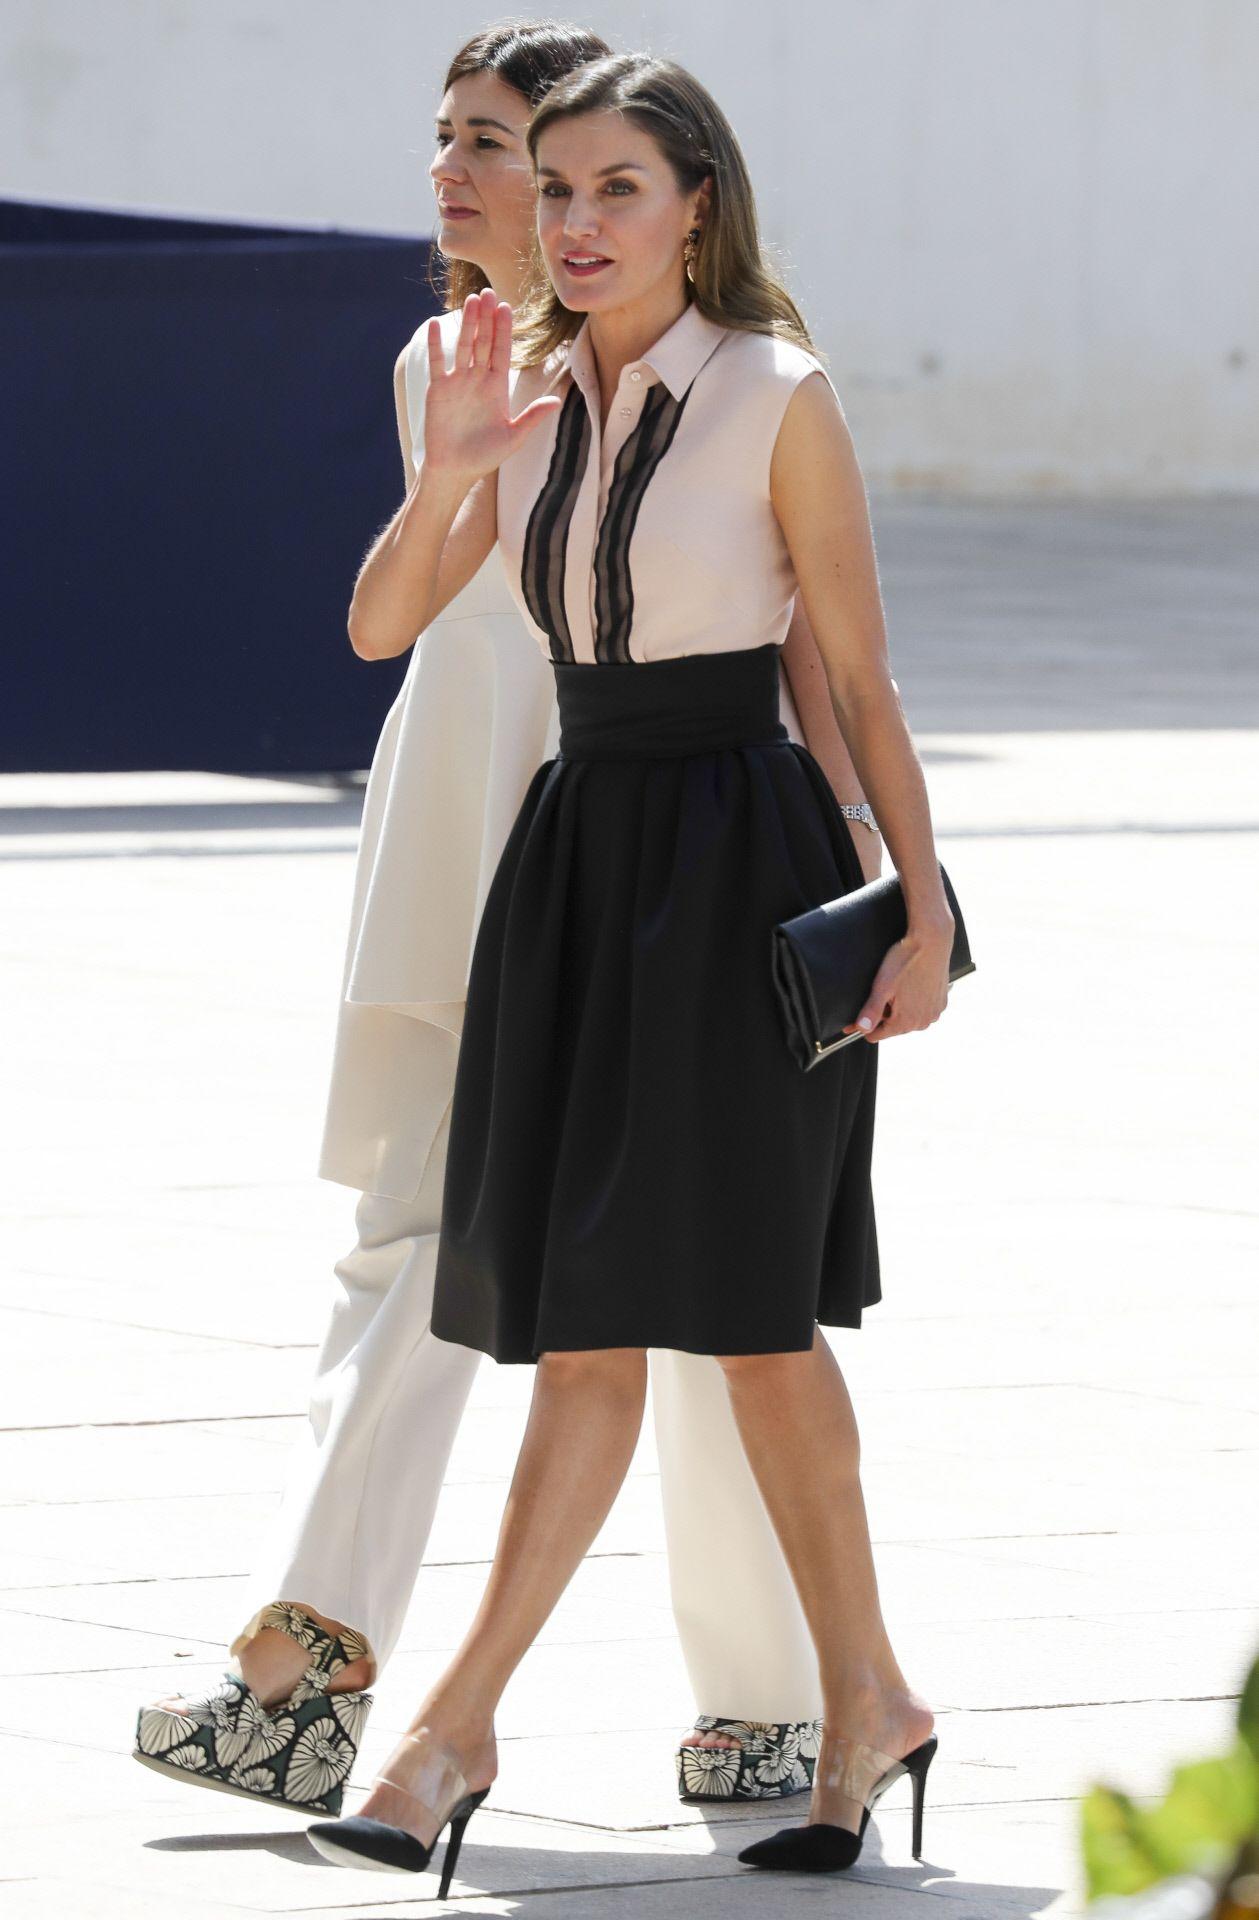 Letizia Todos El 'looks' Reina Estilo La De Los wqIq8U